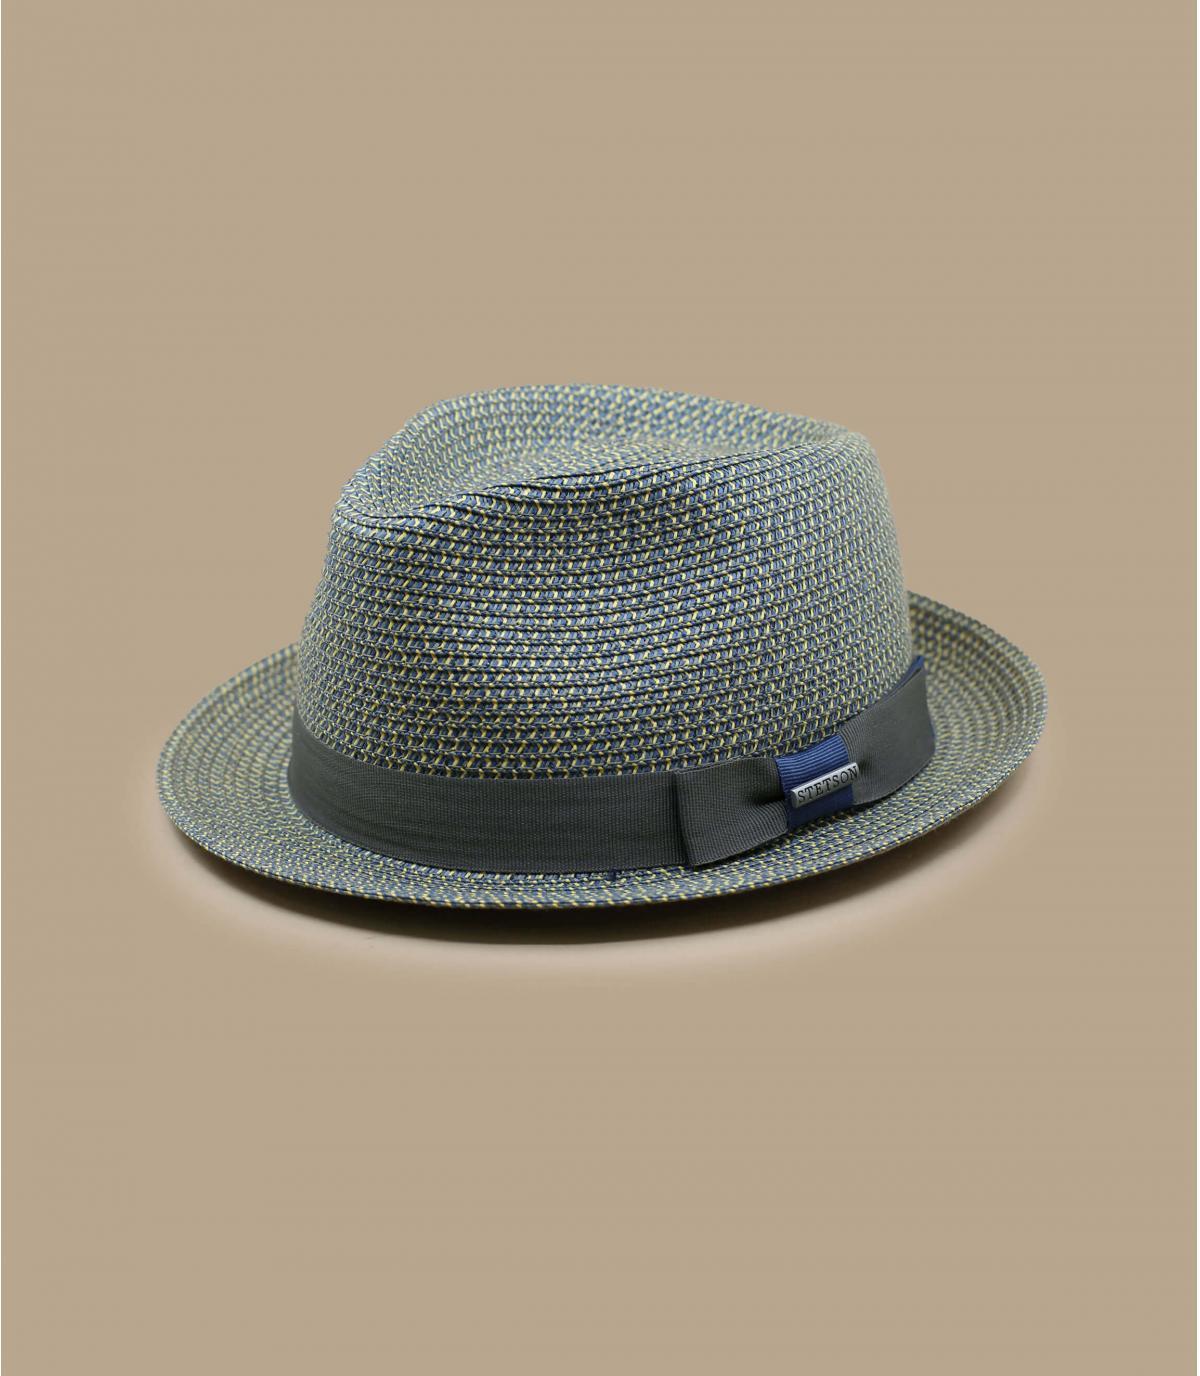 Details Trilby Toyo blue grey - afbeeling 2